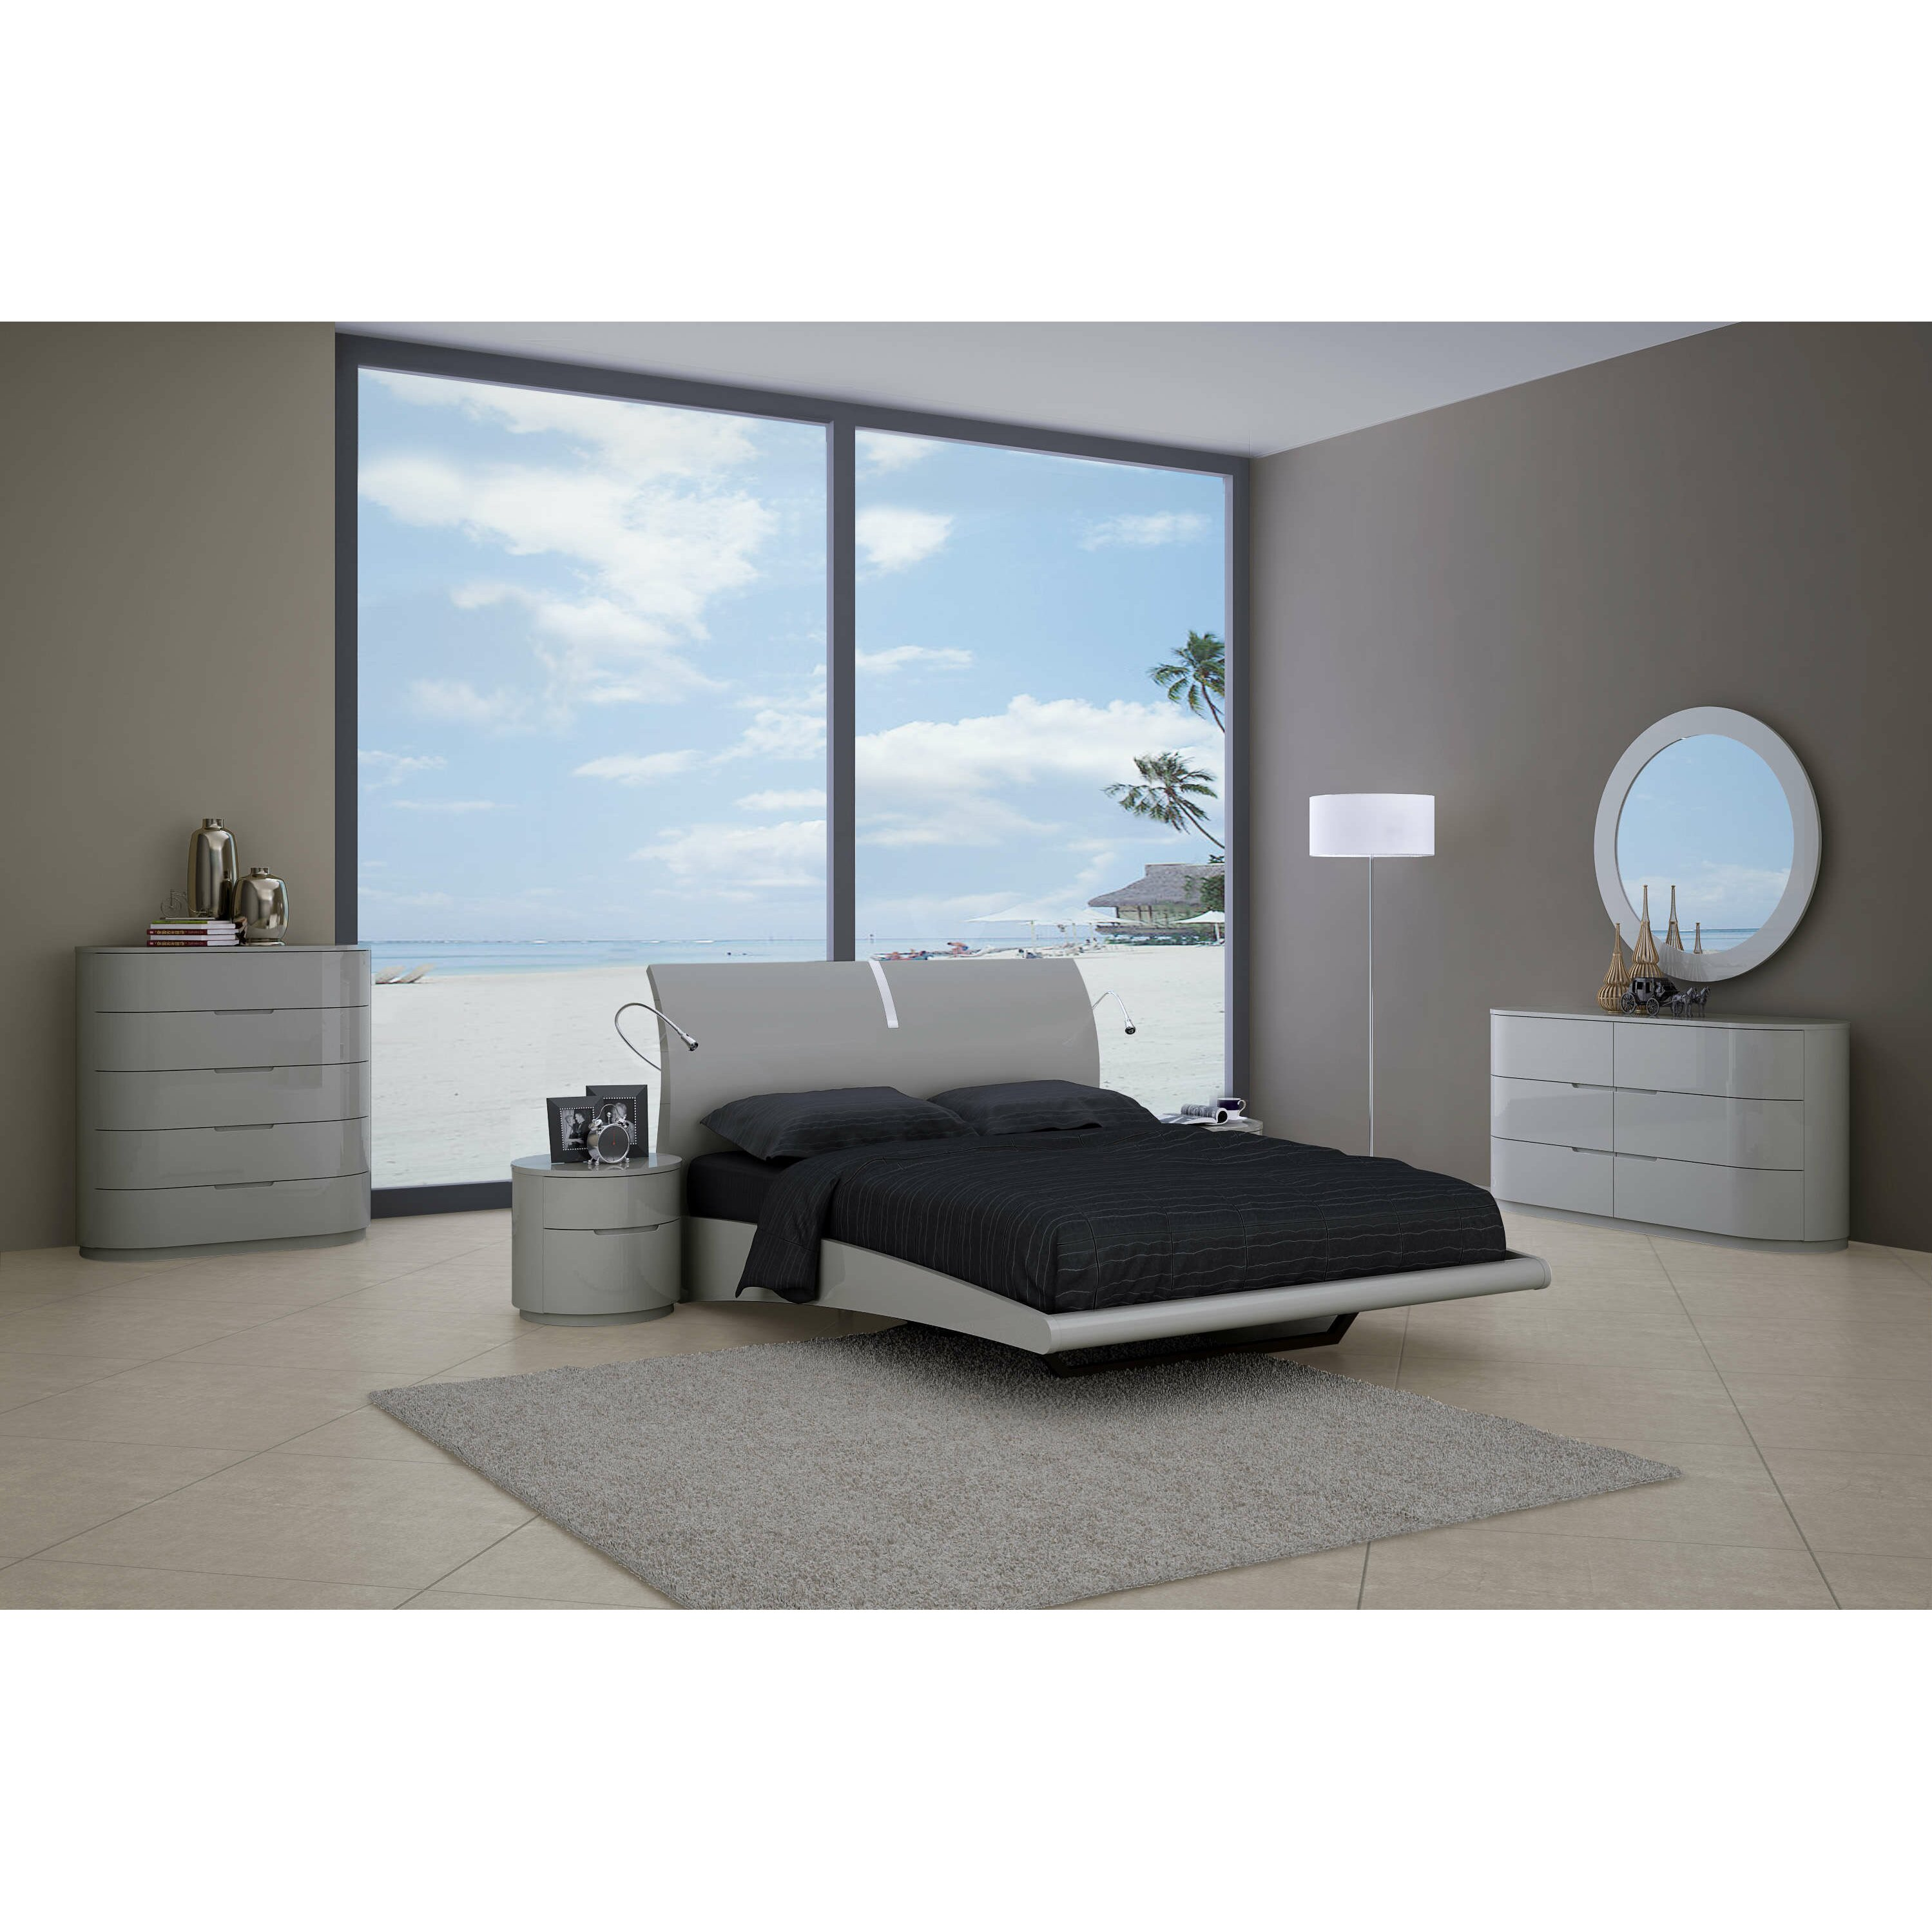 Bolia Mbler: Trendy Contemporary Furniture